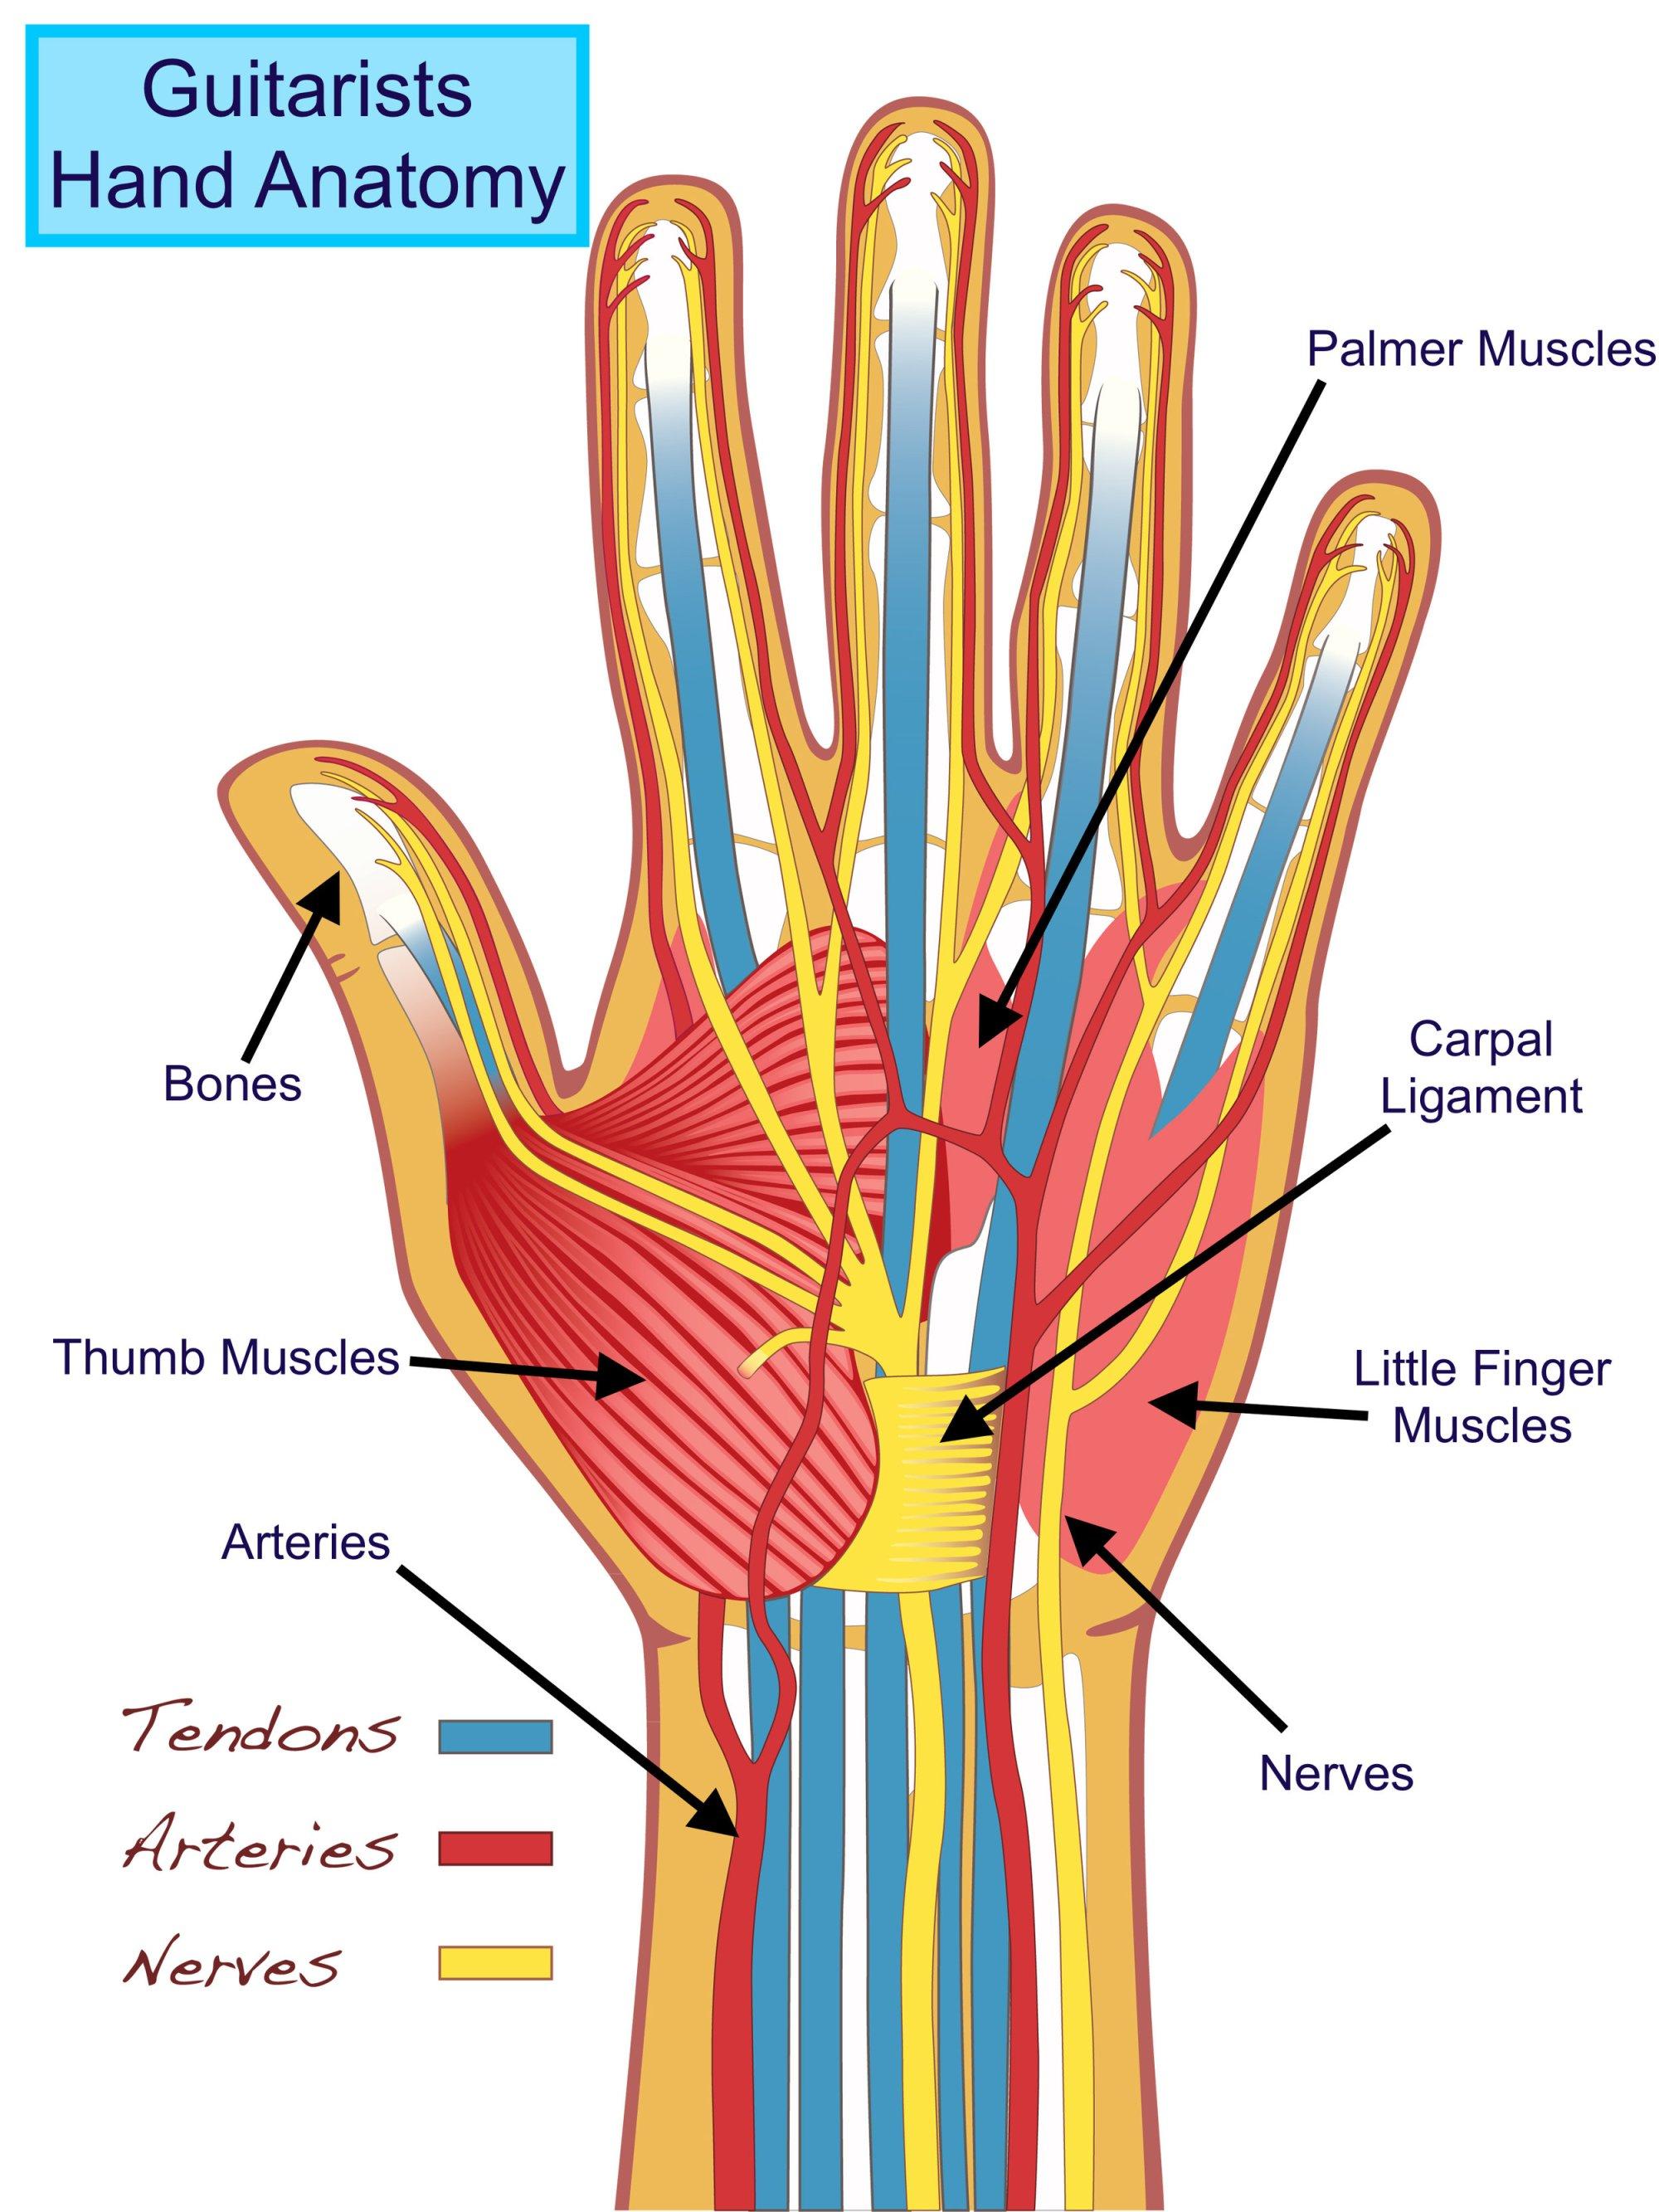 hight resolution of hand anatomy u2014 tuned in guitar lessonsguitarist u0027s hand anatomy